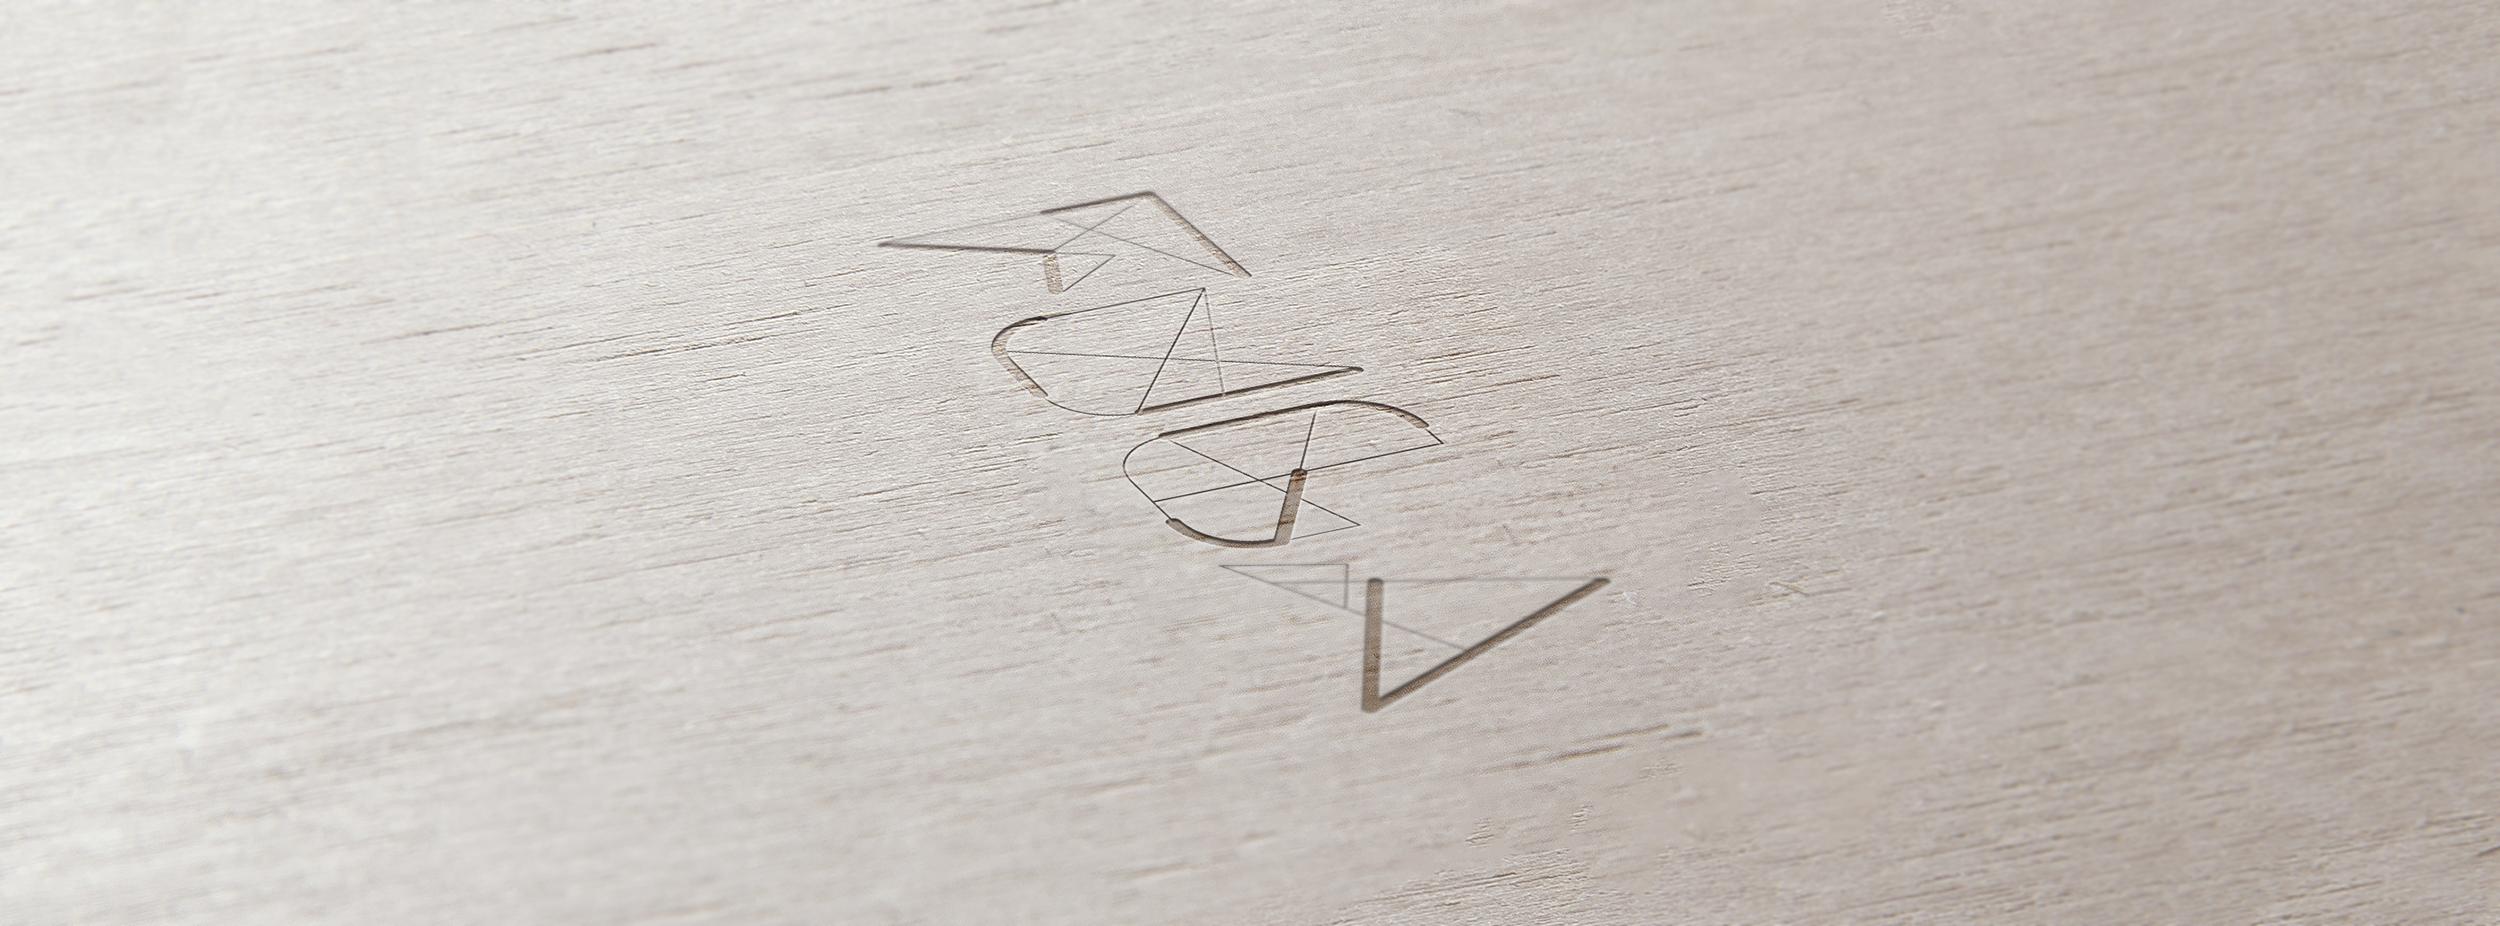 Fuga Company Branding Logo Identity Graphic Design bonjourmolotov 06Web.jpg